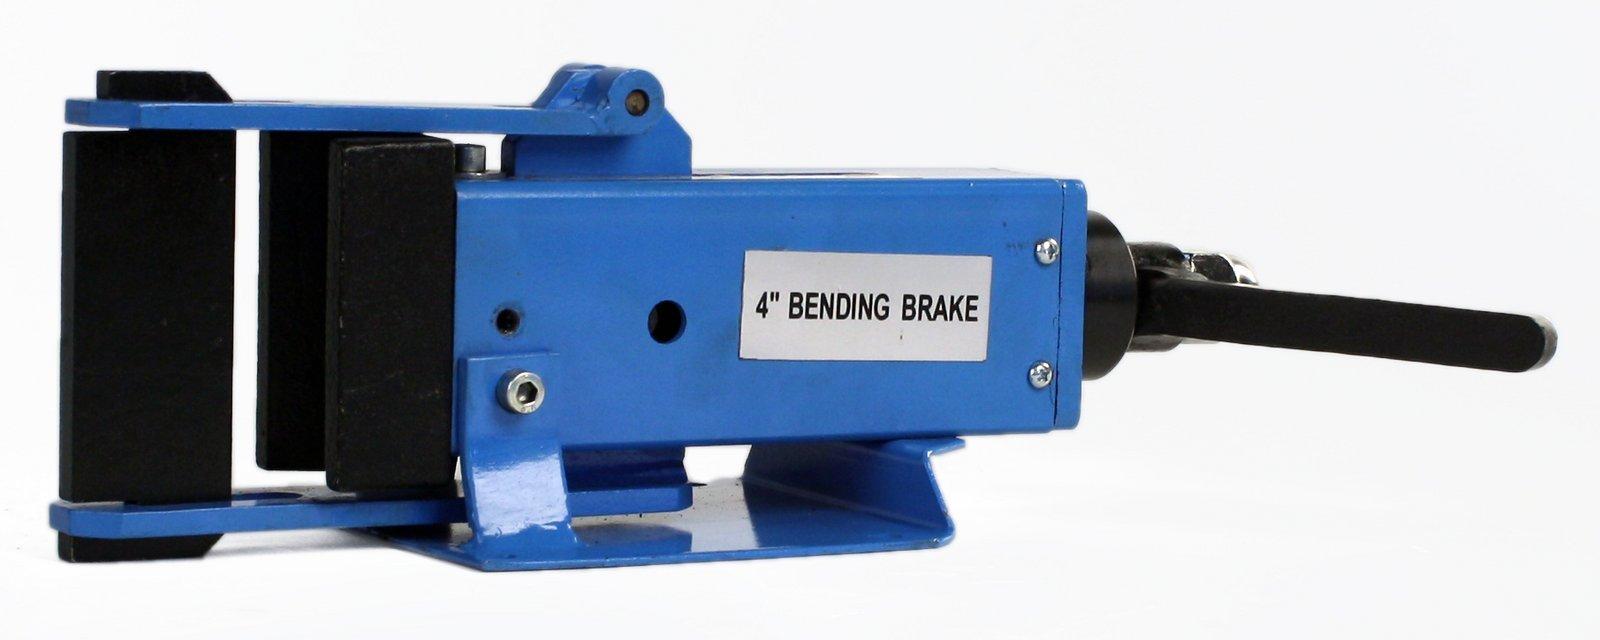 Erie Tools 4'' Hand Operated Steel Bending Brake & Sheet Metal Form Bender with Pressing Die & Stop Assembly